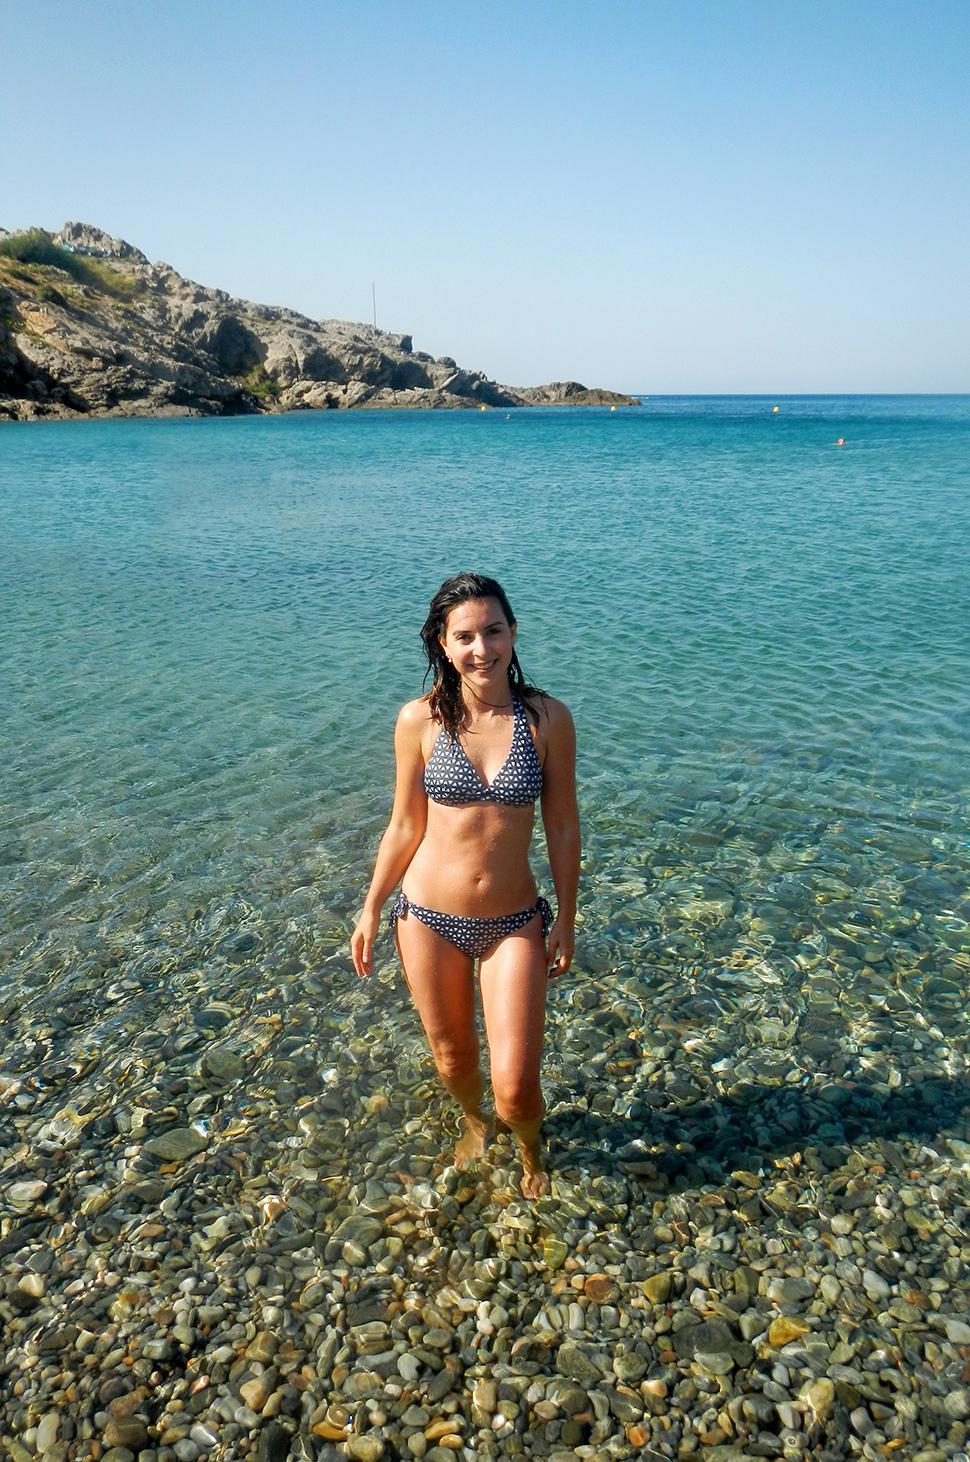 Helloitsvalentine_summer_holidays_29